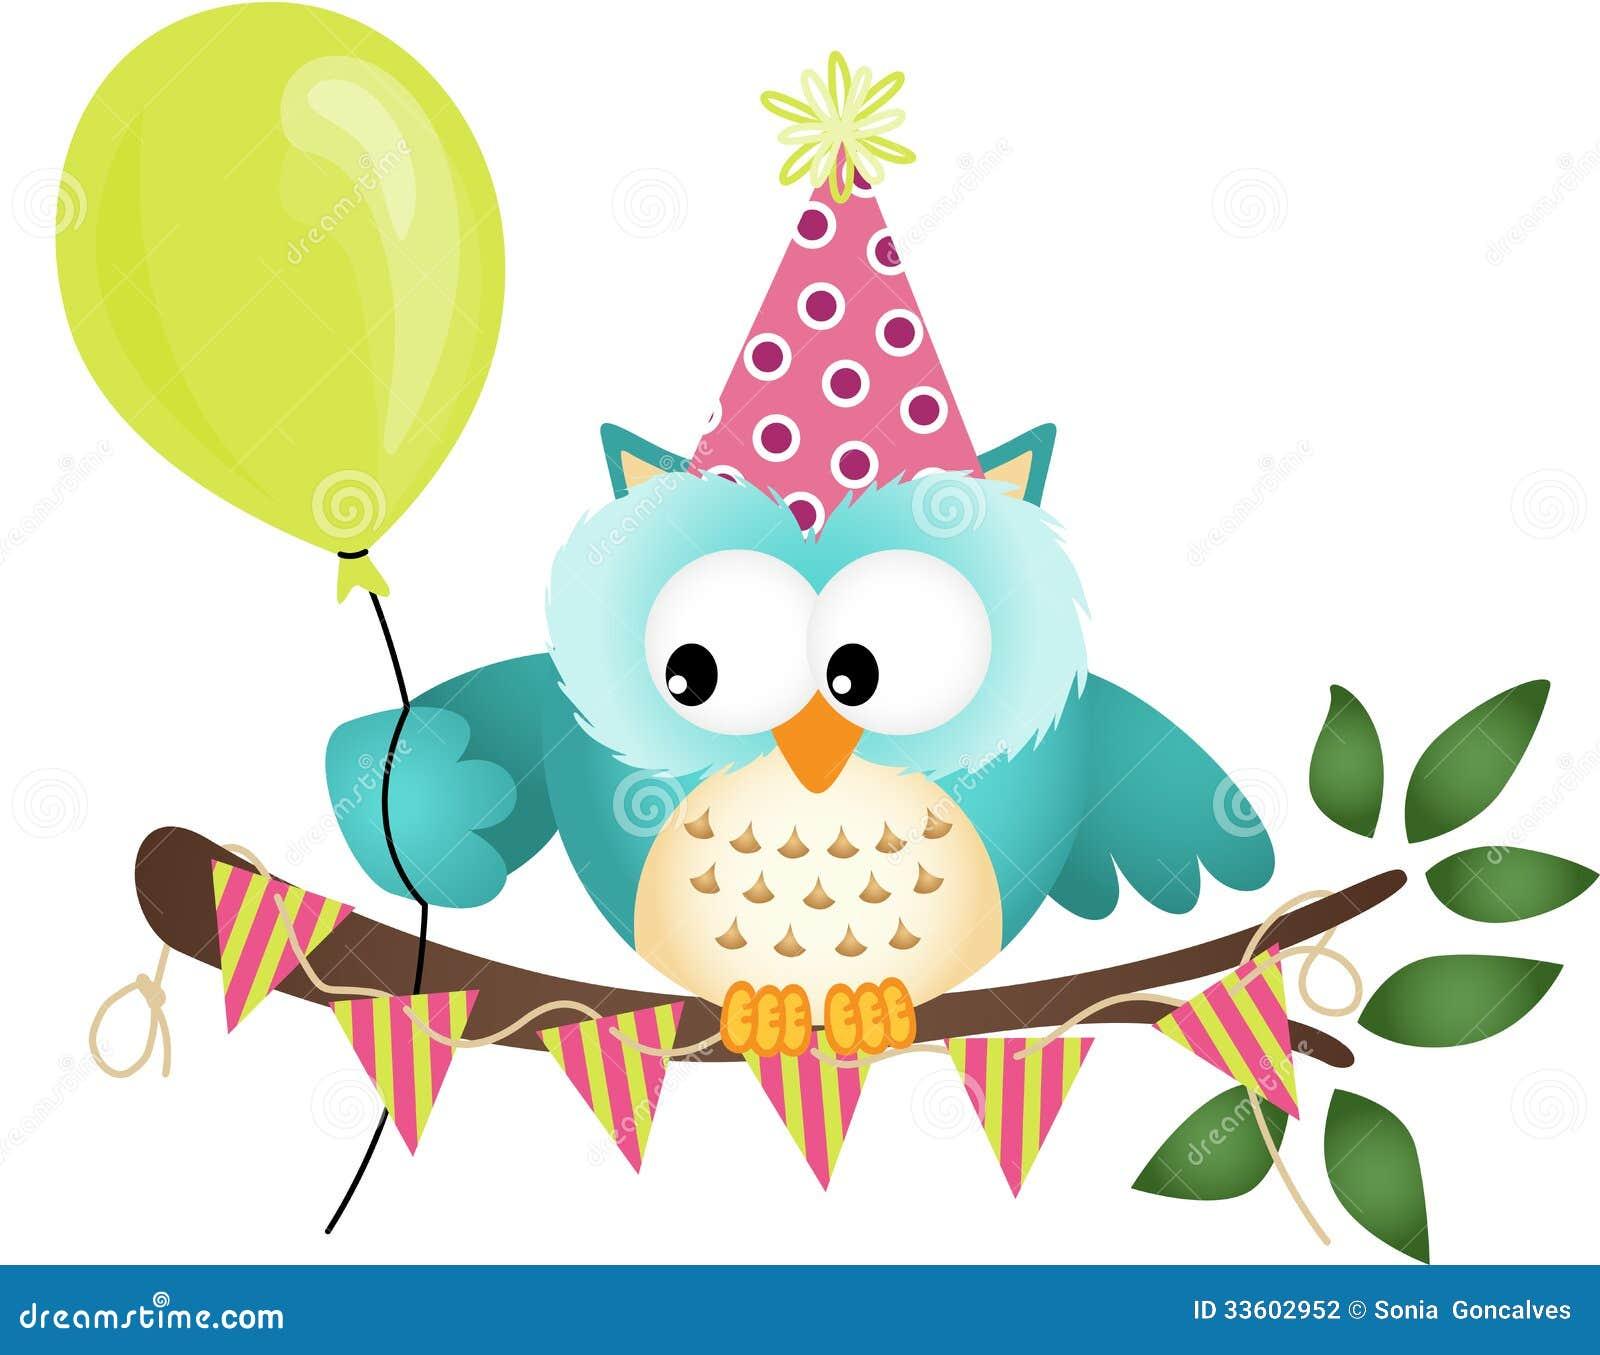 Owl Happy Birthday